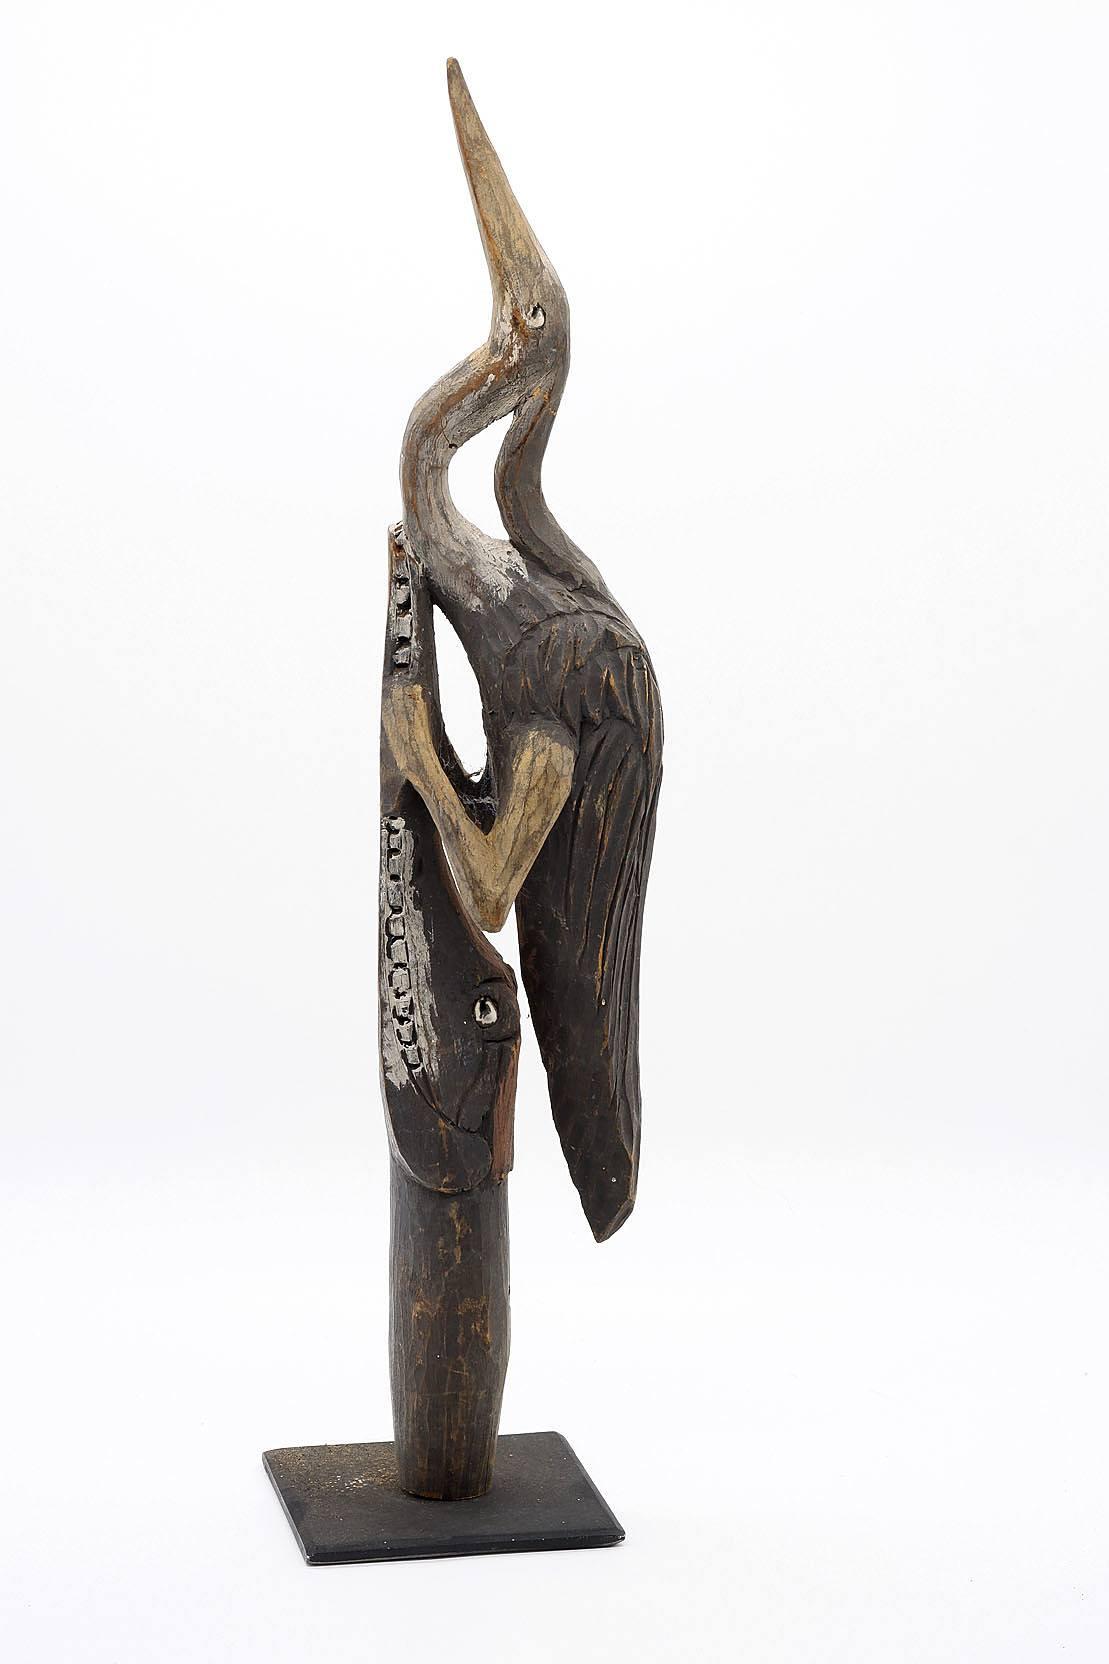 'Mounted New Guinea Finial'